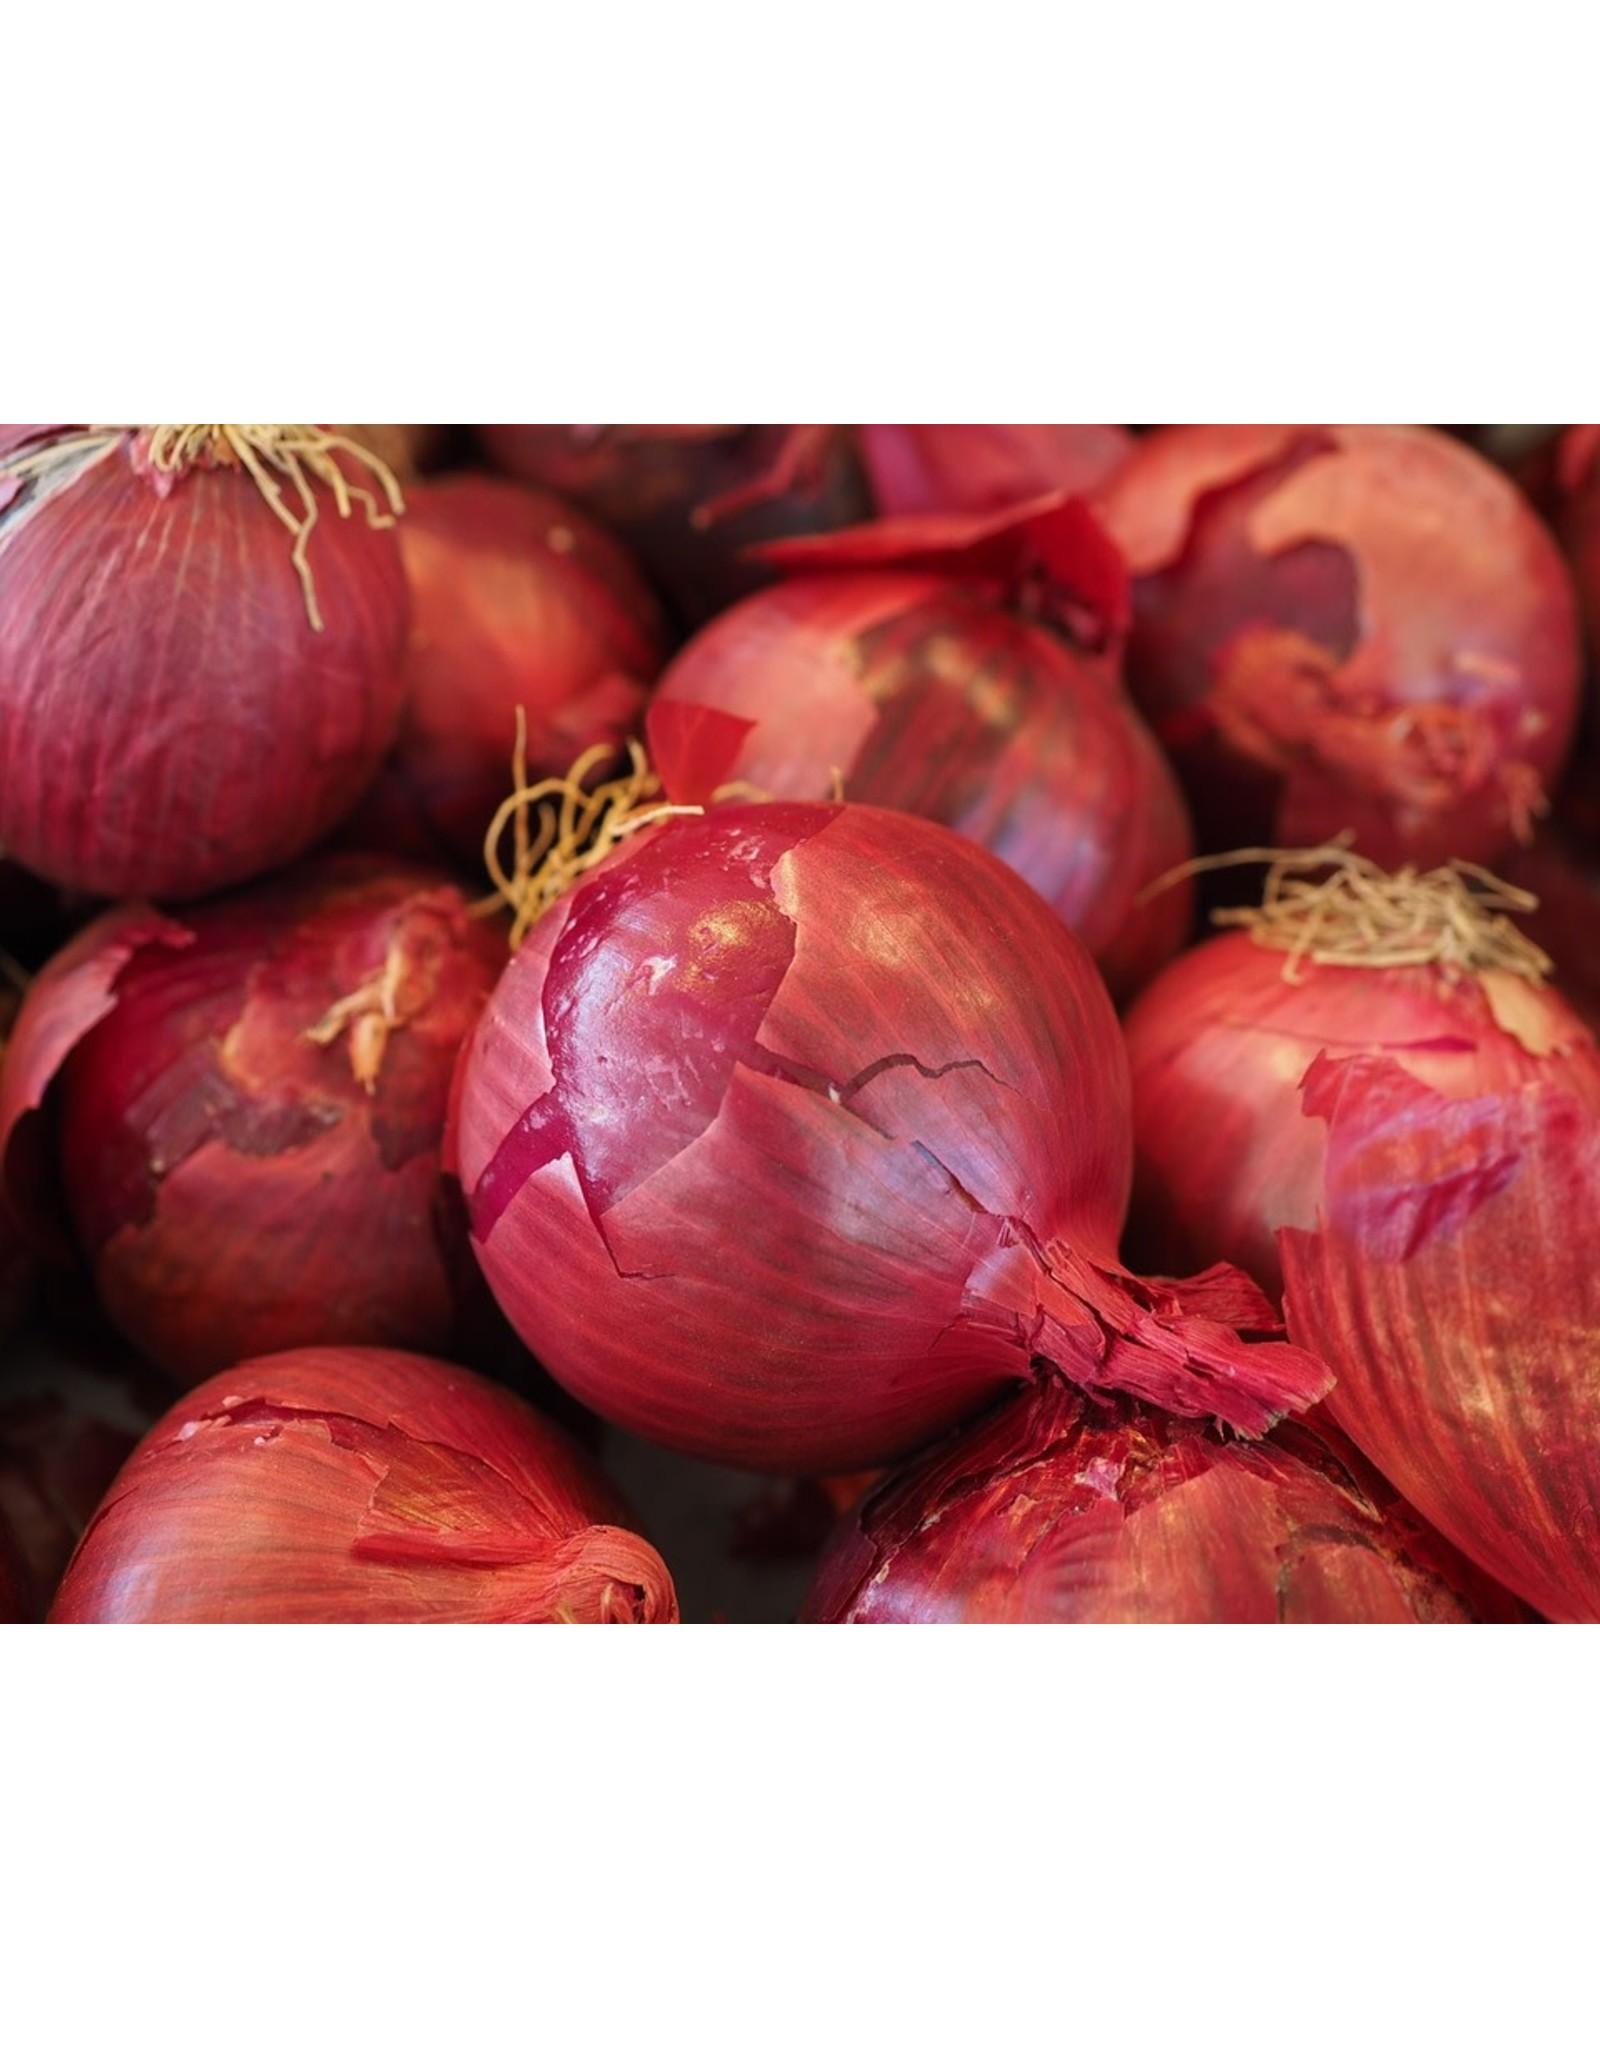 Bulb - Dutch Onions - Red Baron